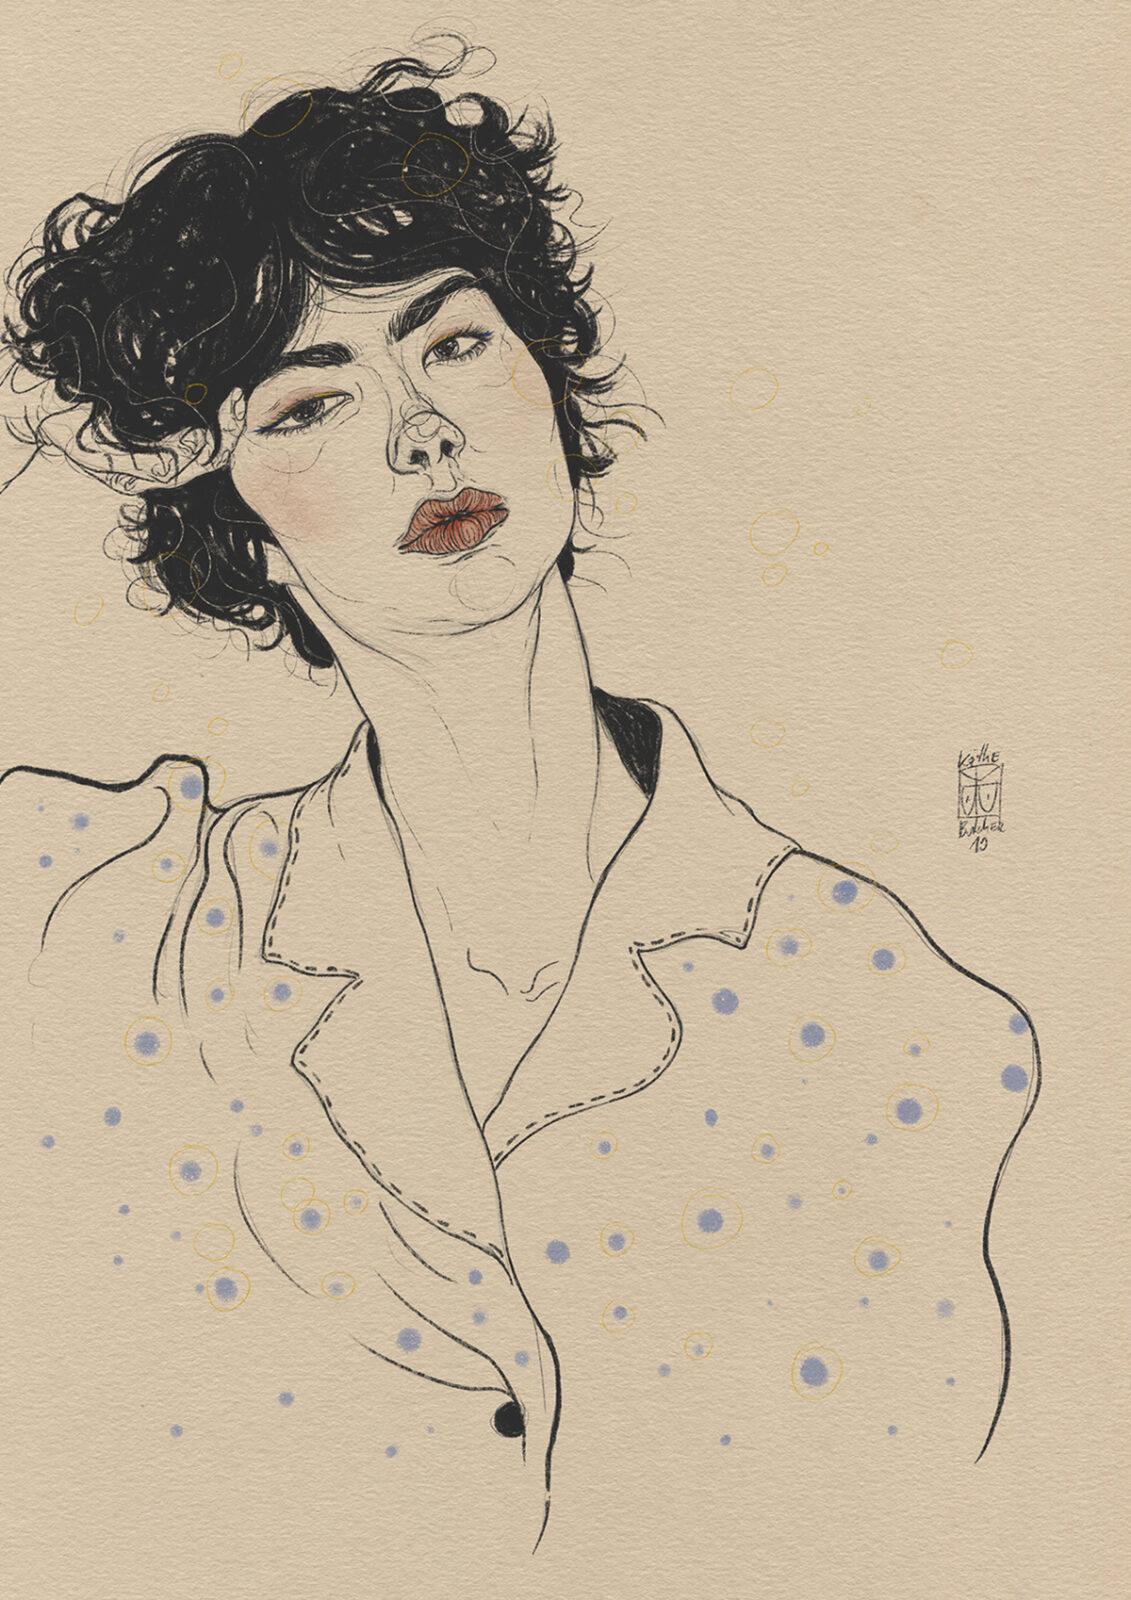 The sensuality and femininity illustrations by Käthe Butcher